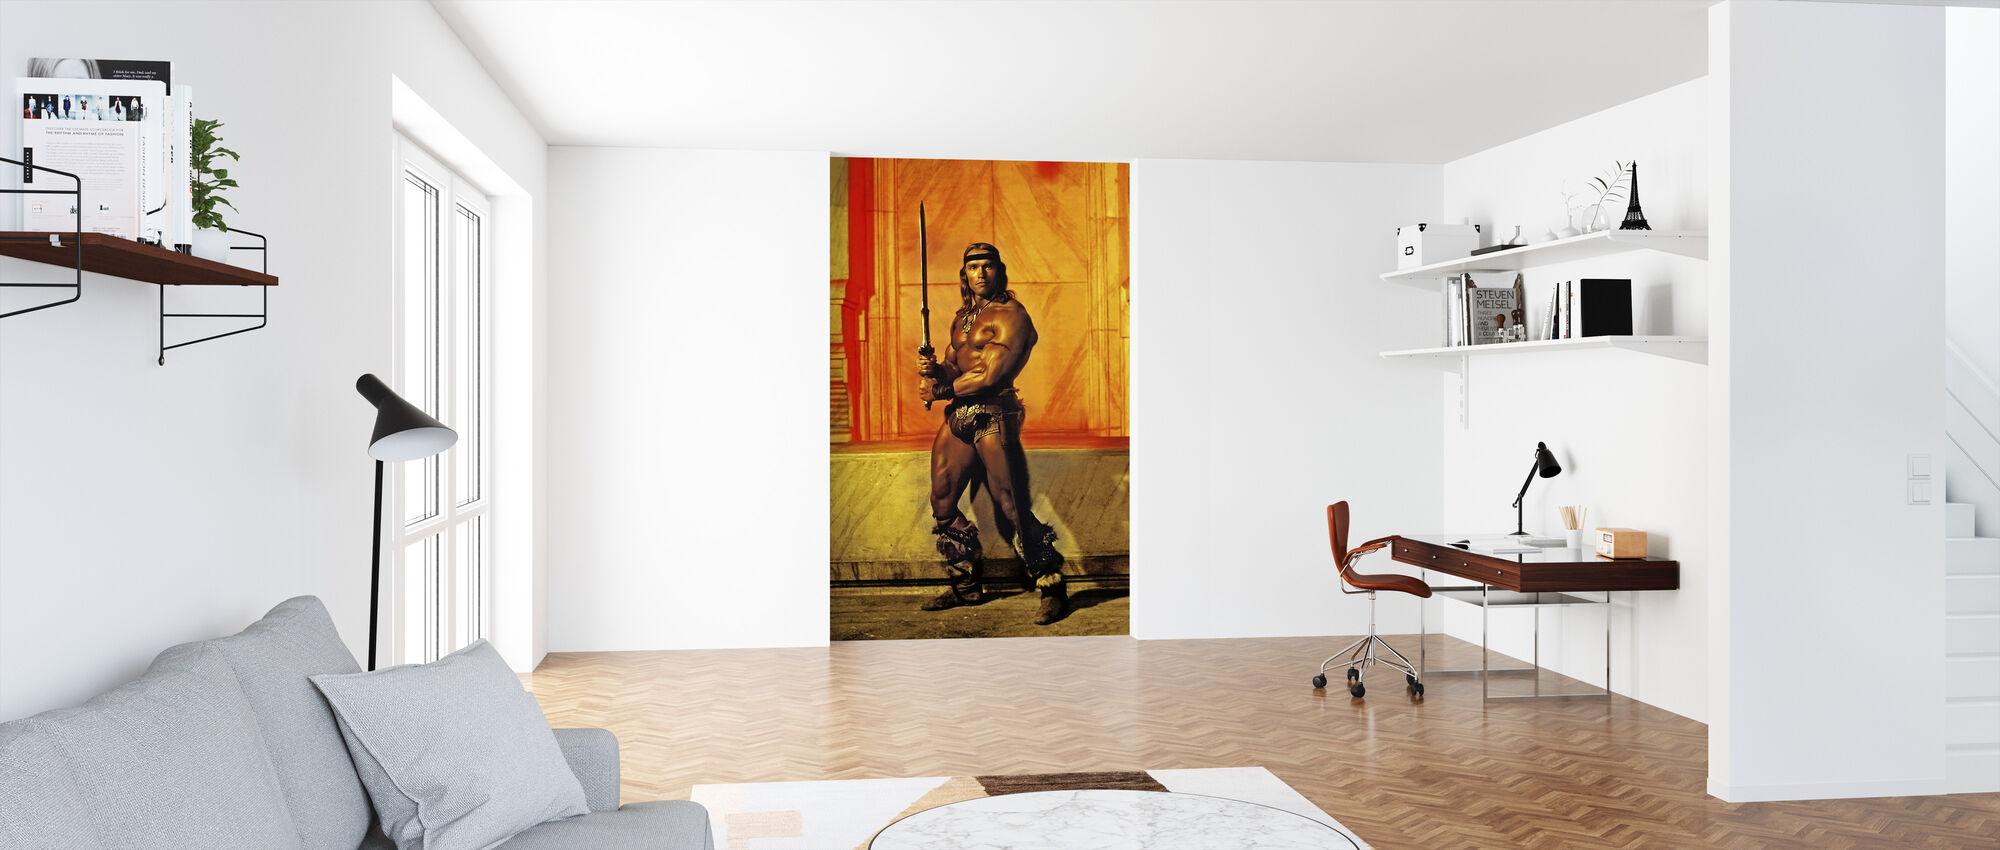 Arnold Schwarzenegger in Conan the Destroyer - Wallpaper - Office